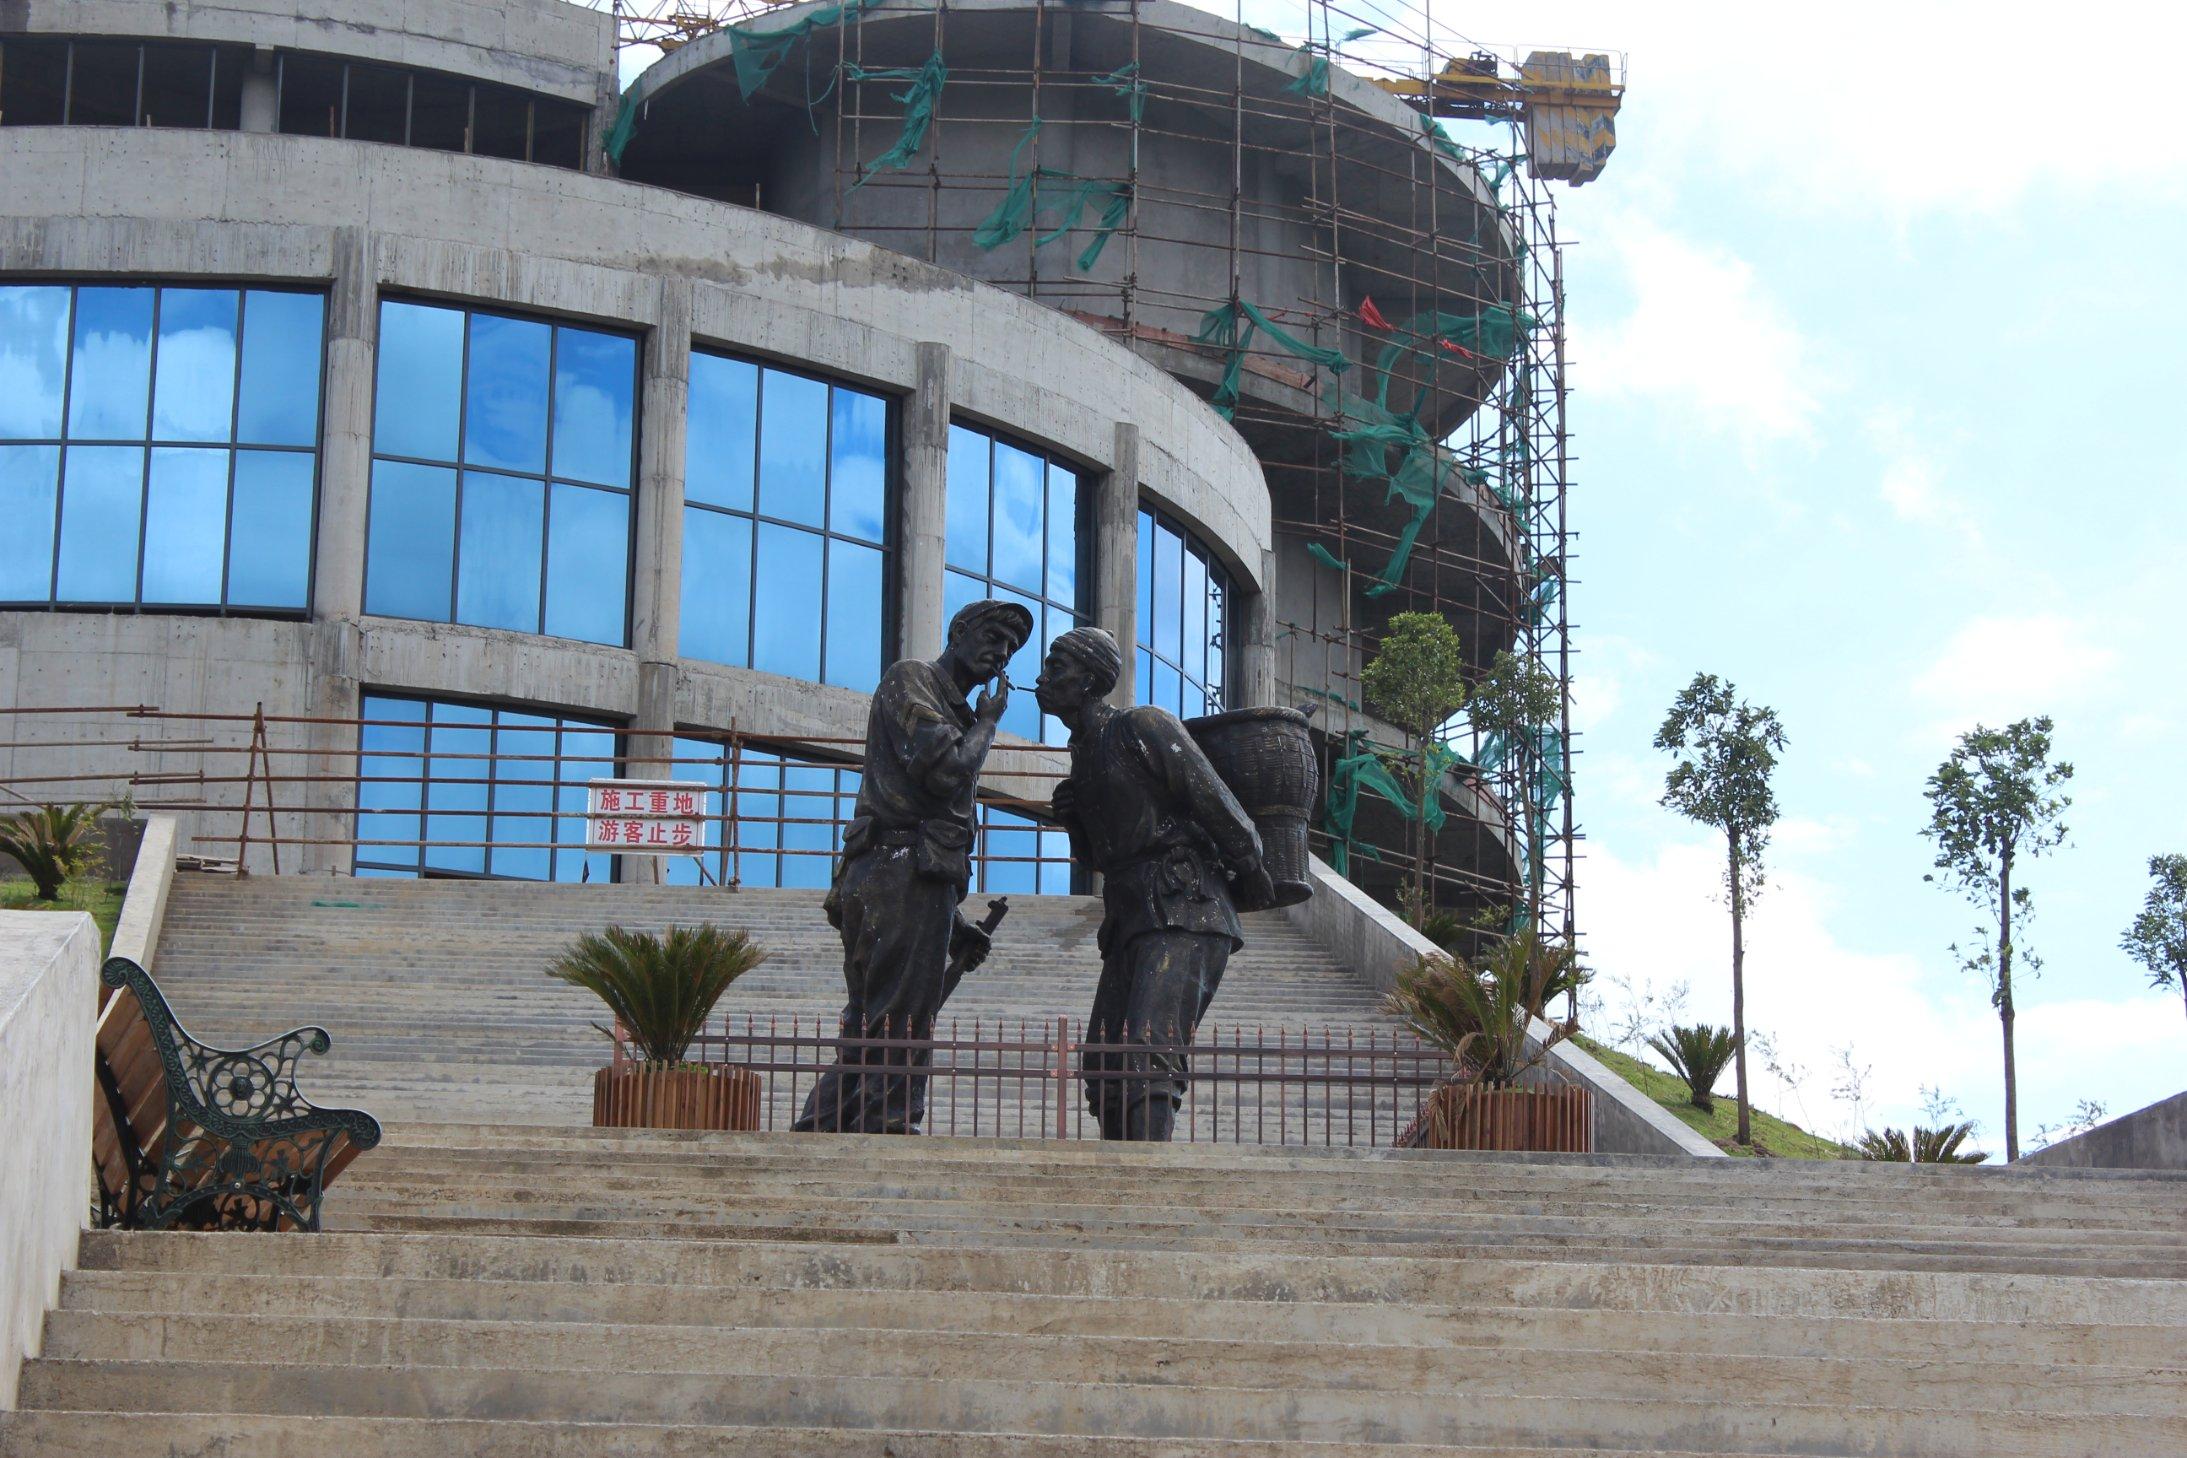 China's 24-bend road in Guizhou: A driving adventure | CNN Travel